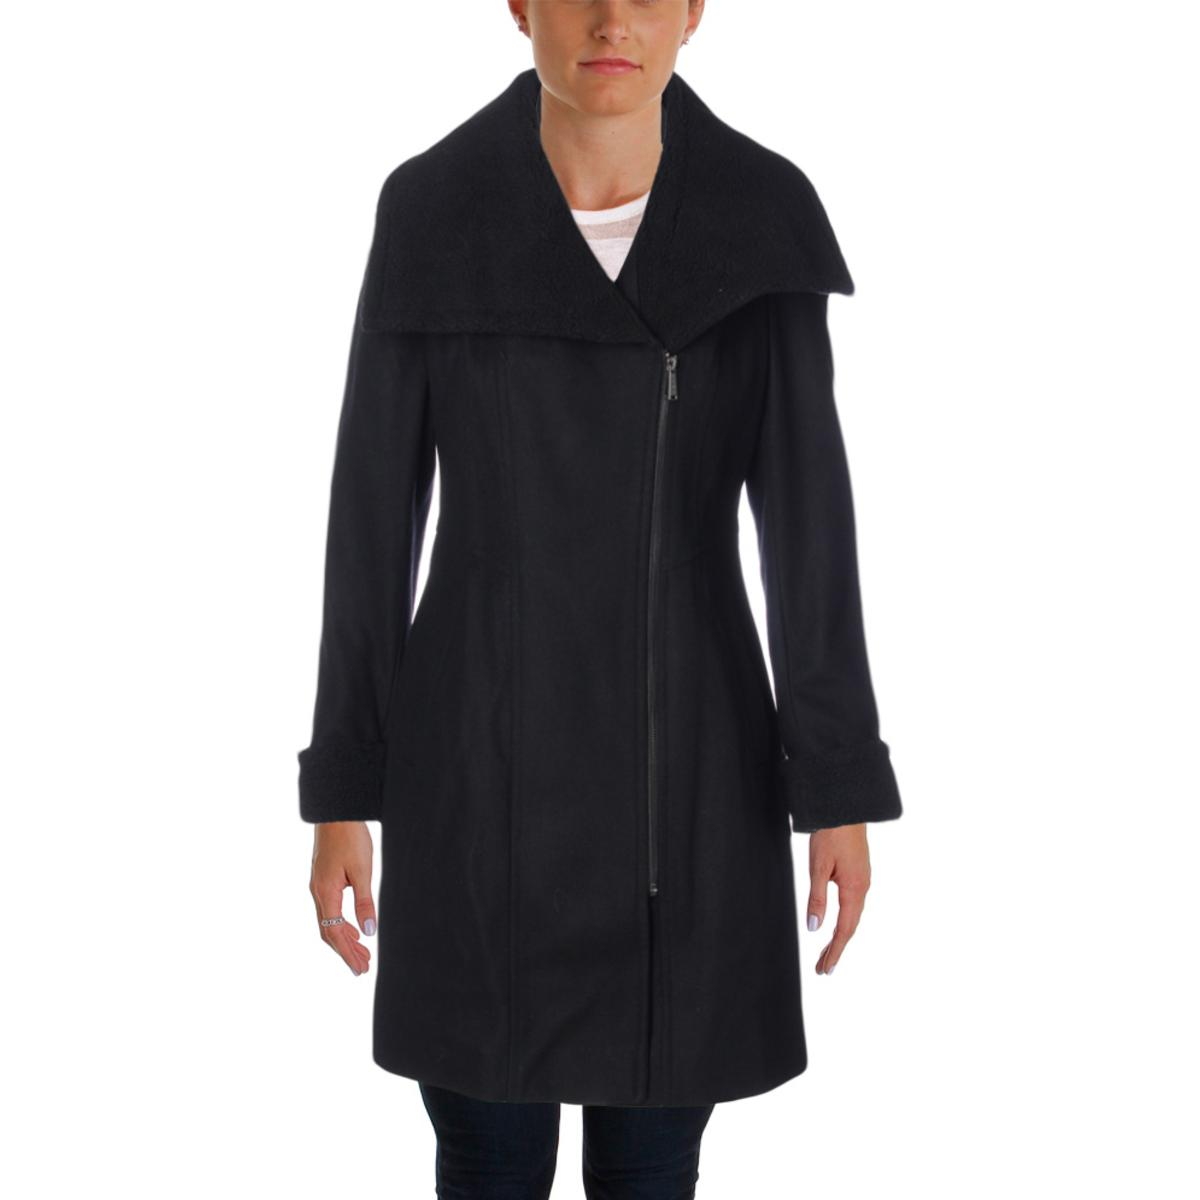 Dkny jackets women